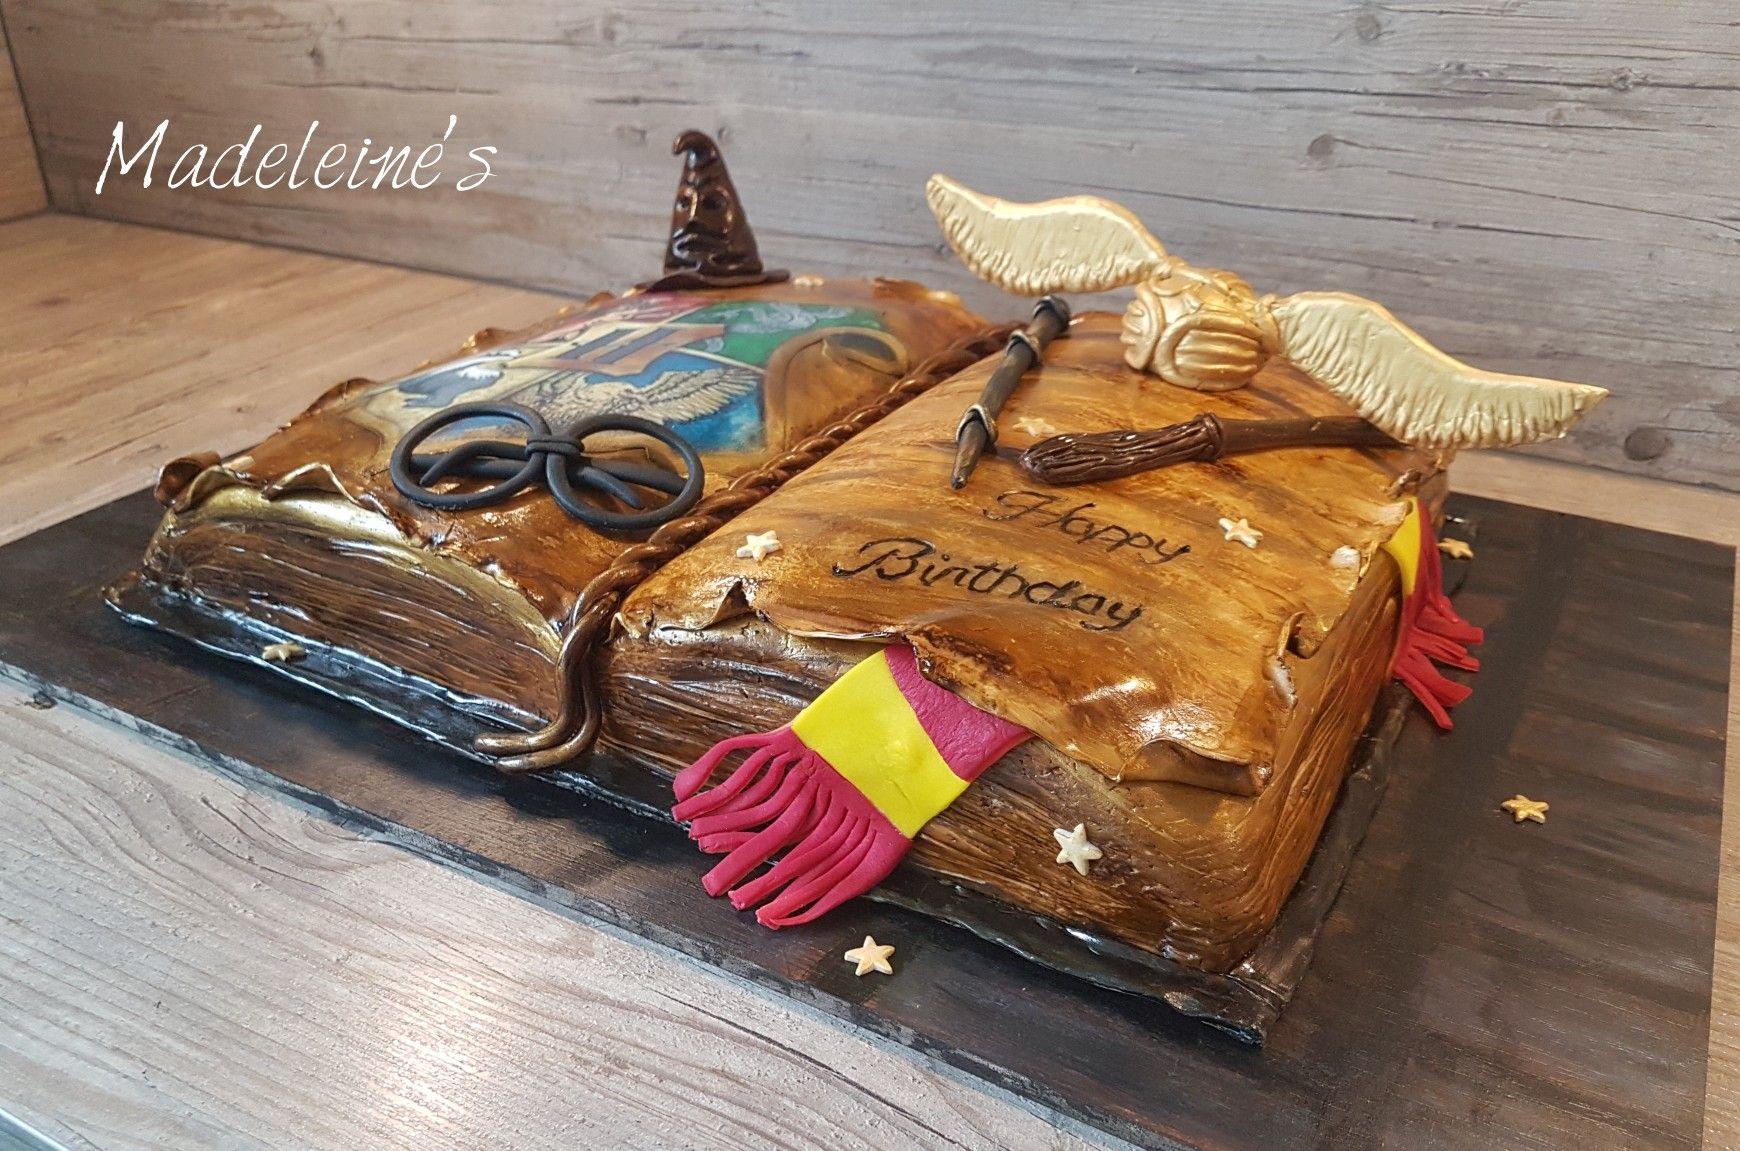 Harry Potter Torte Buch Schnatz Gryffendor Schnatz Harry Potter